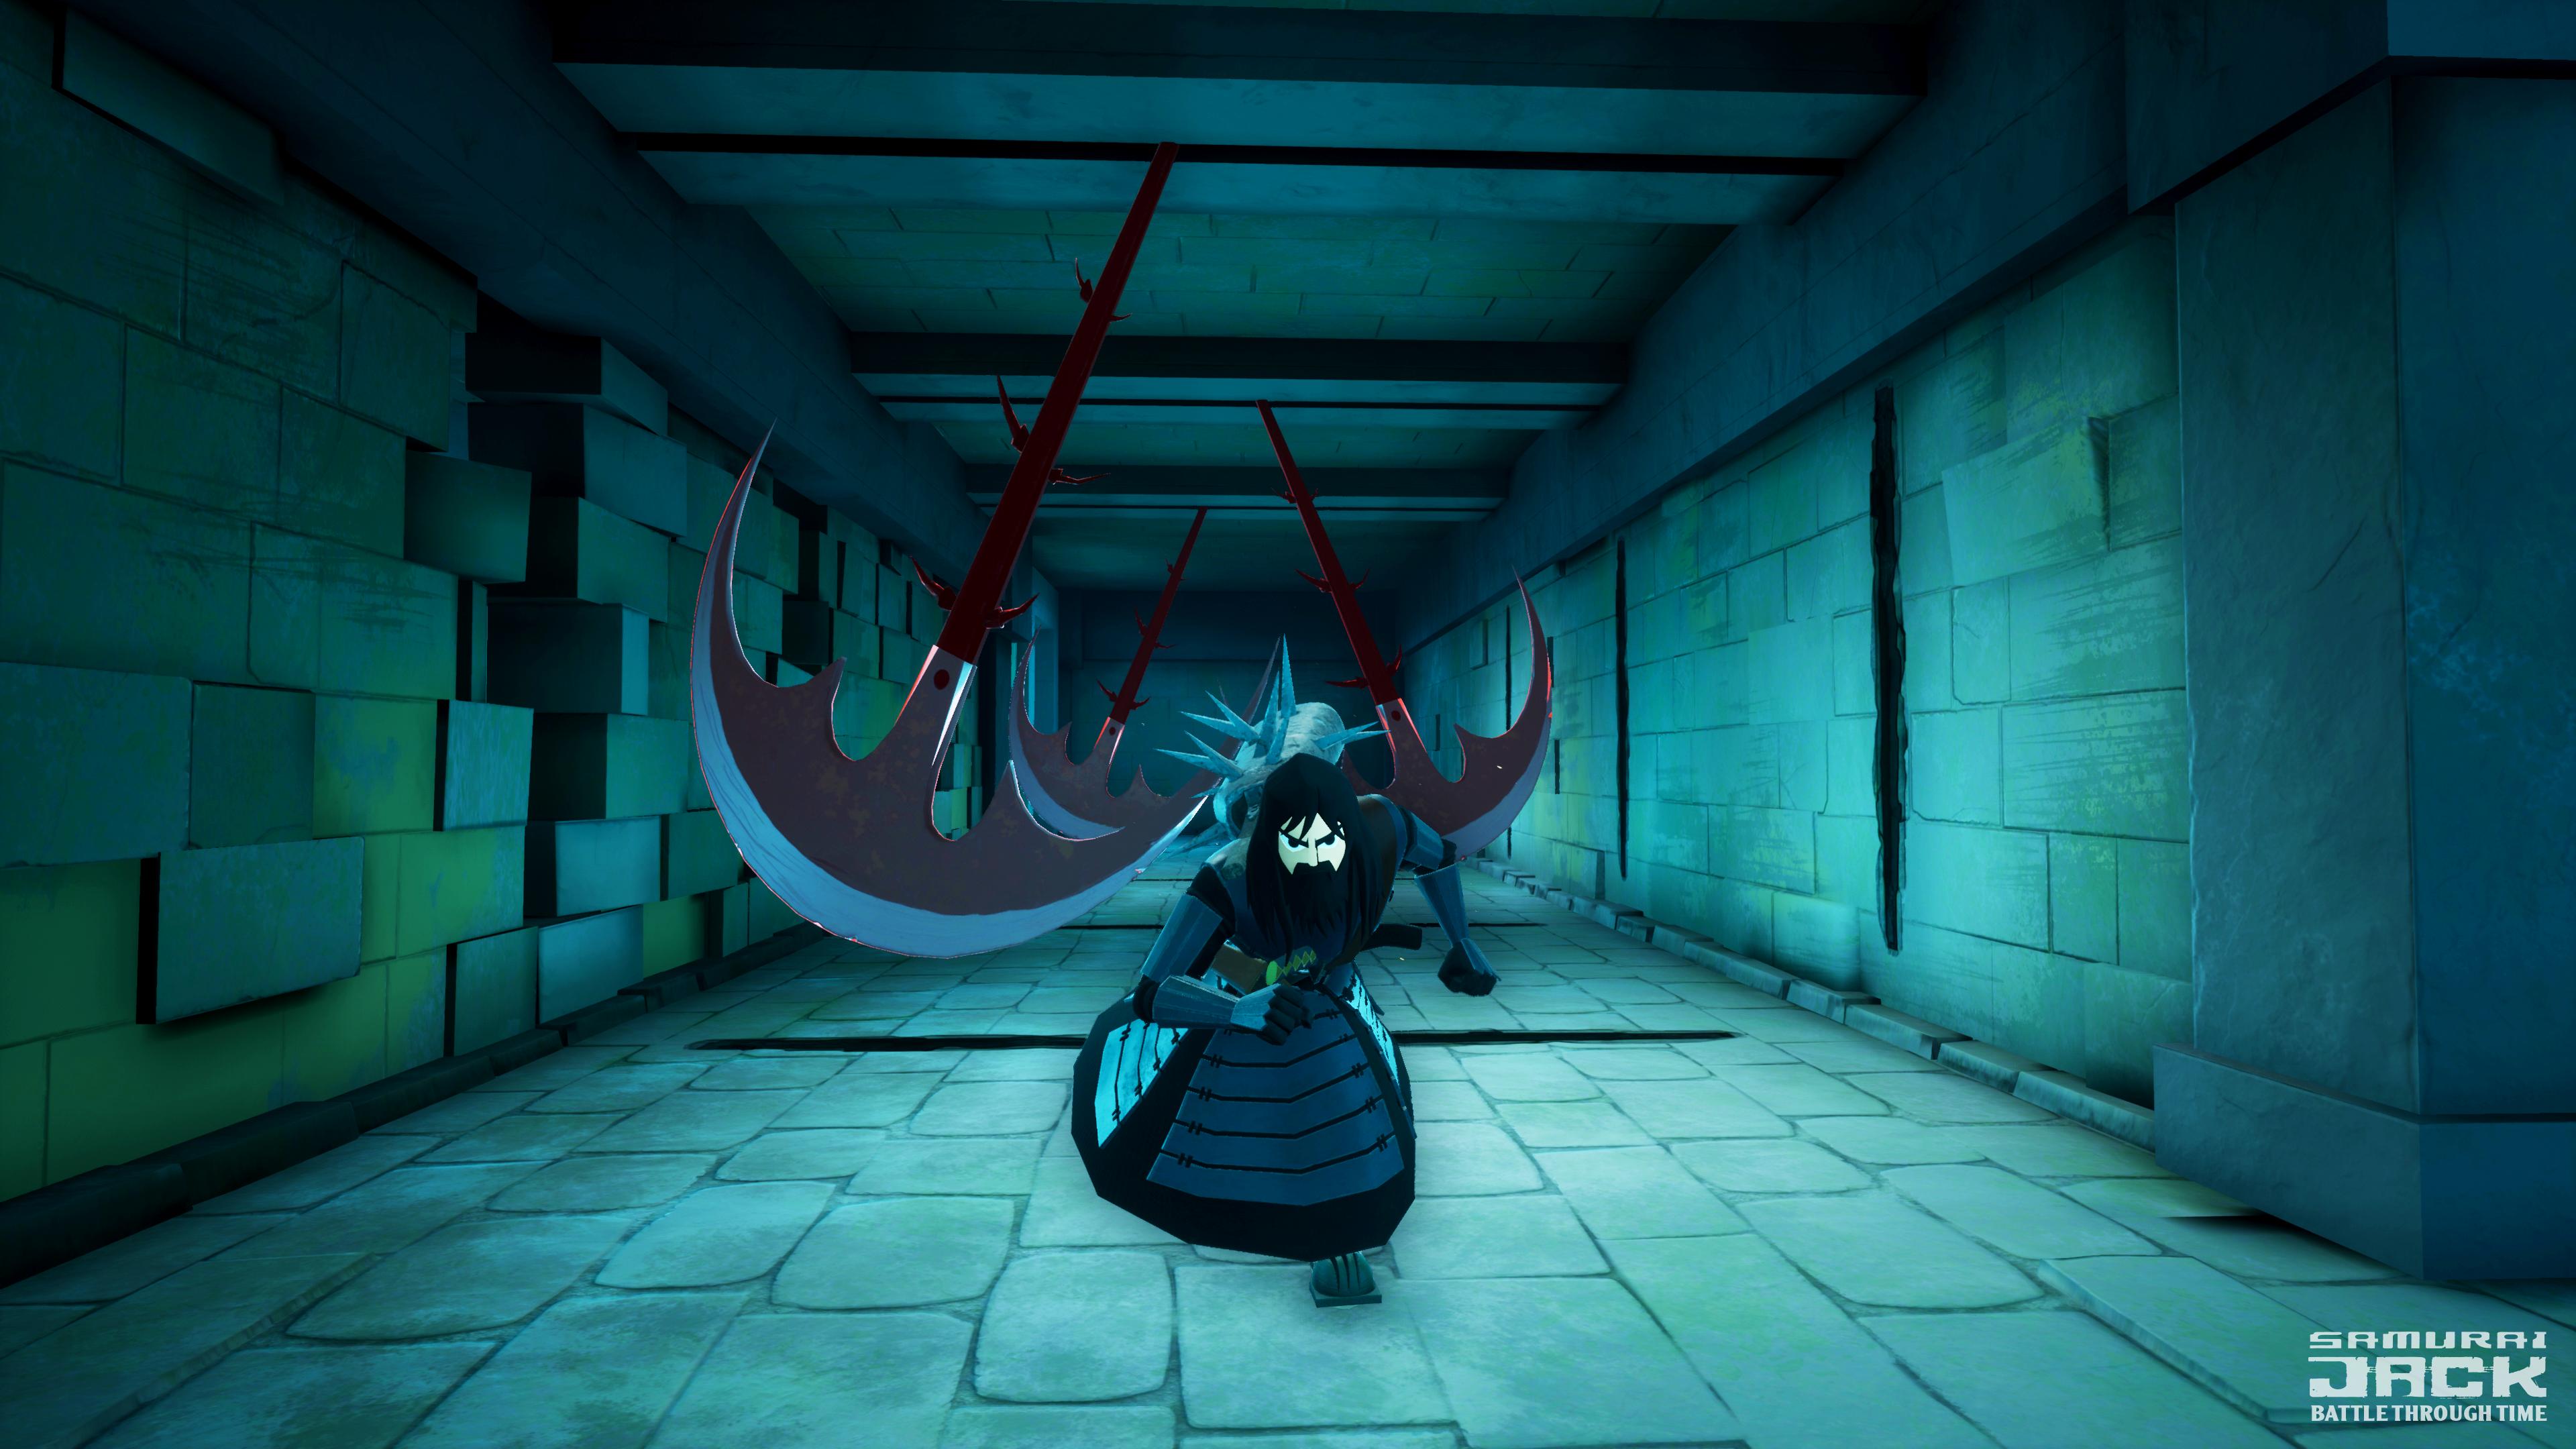 Samurai-Jack-Battle-Through-Time_2020_02-25-20_006